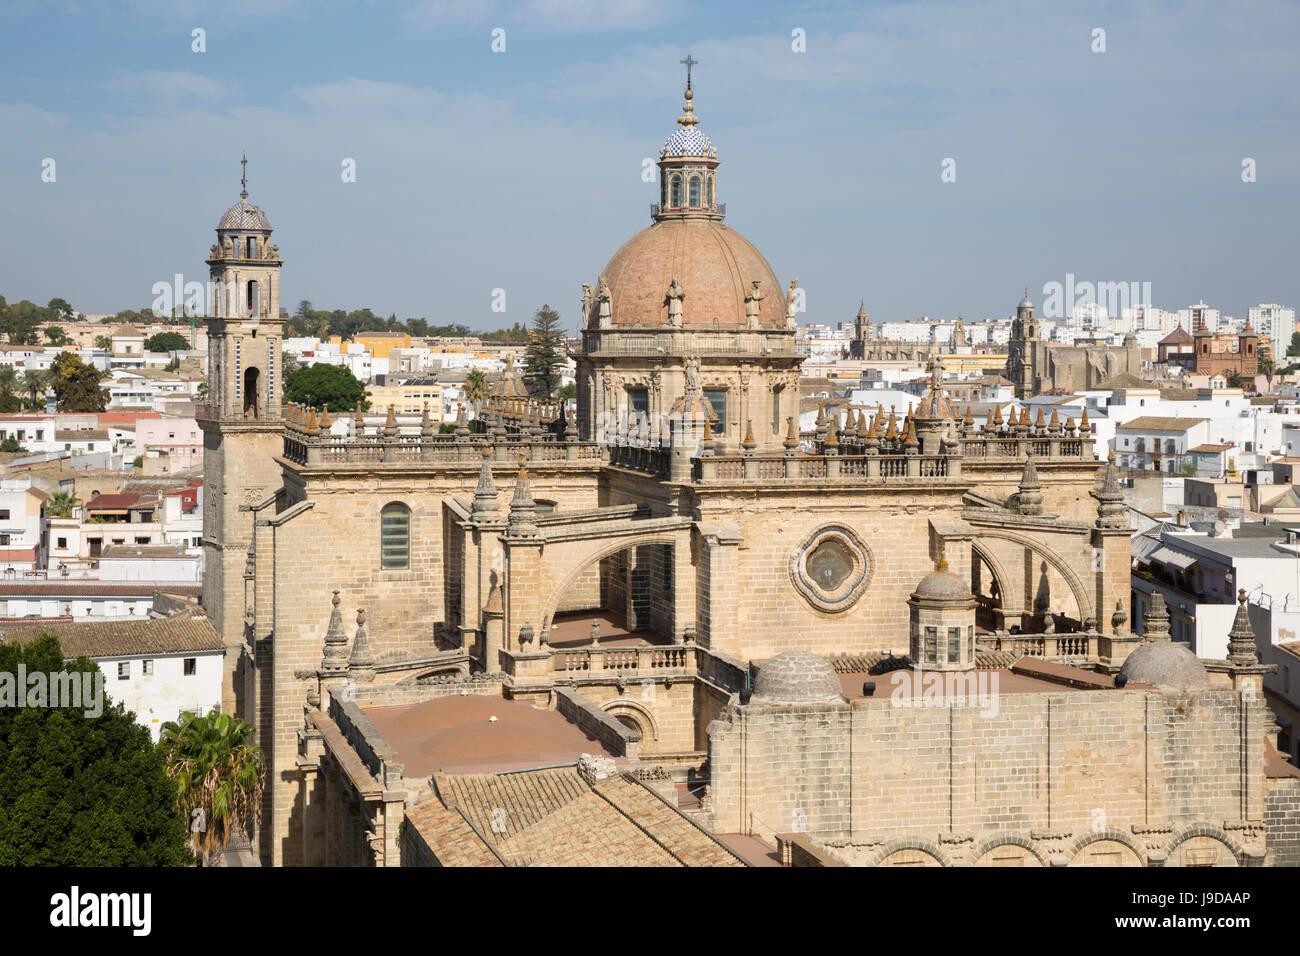 Jerez De La Frontera Kathedrale, Jerez De La Frontera, Cadiz Provinz, Andalusien, Spanien, Europa Stockbild